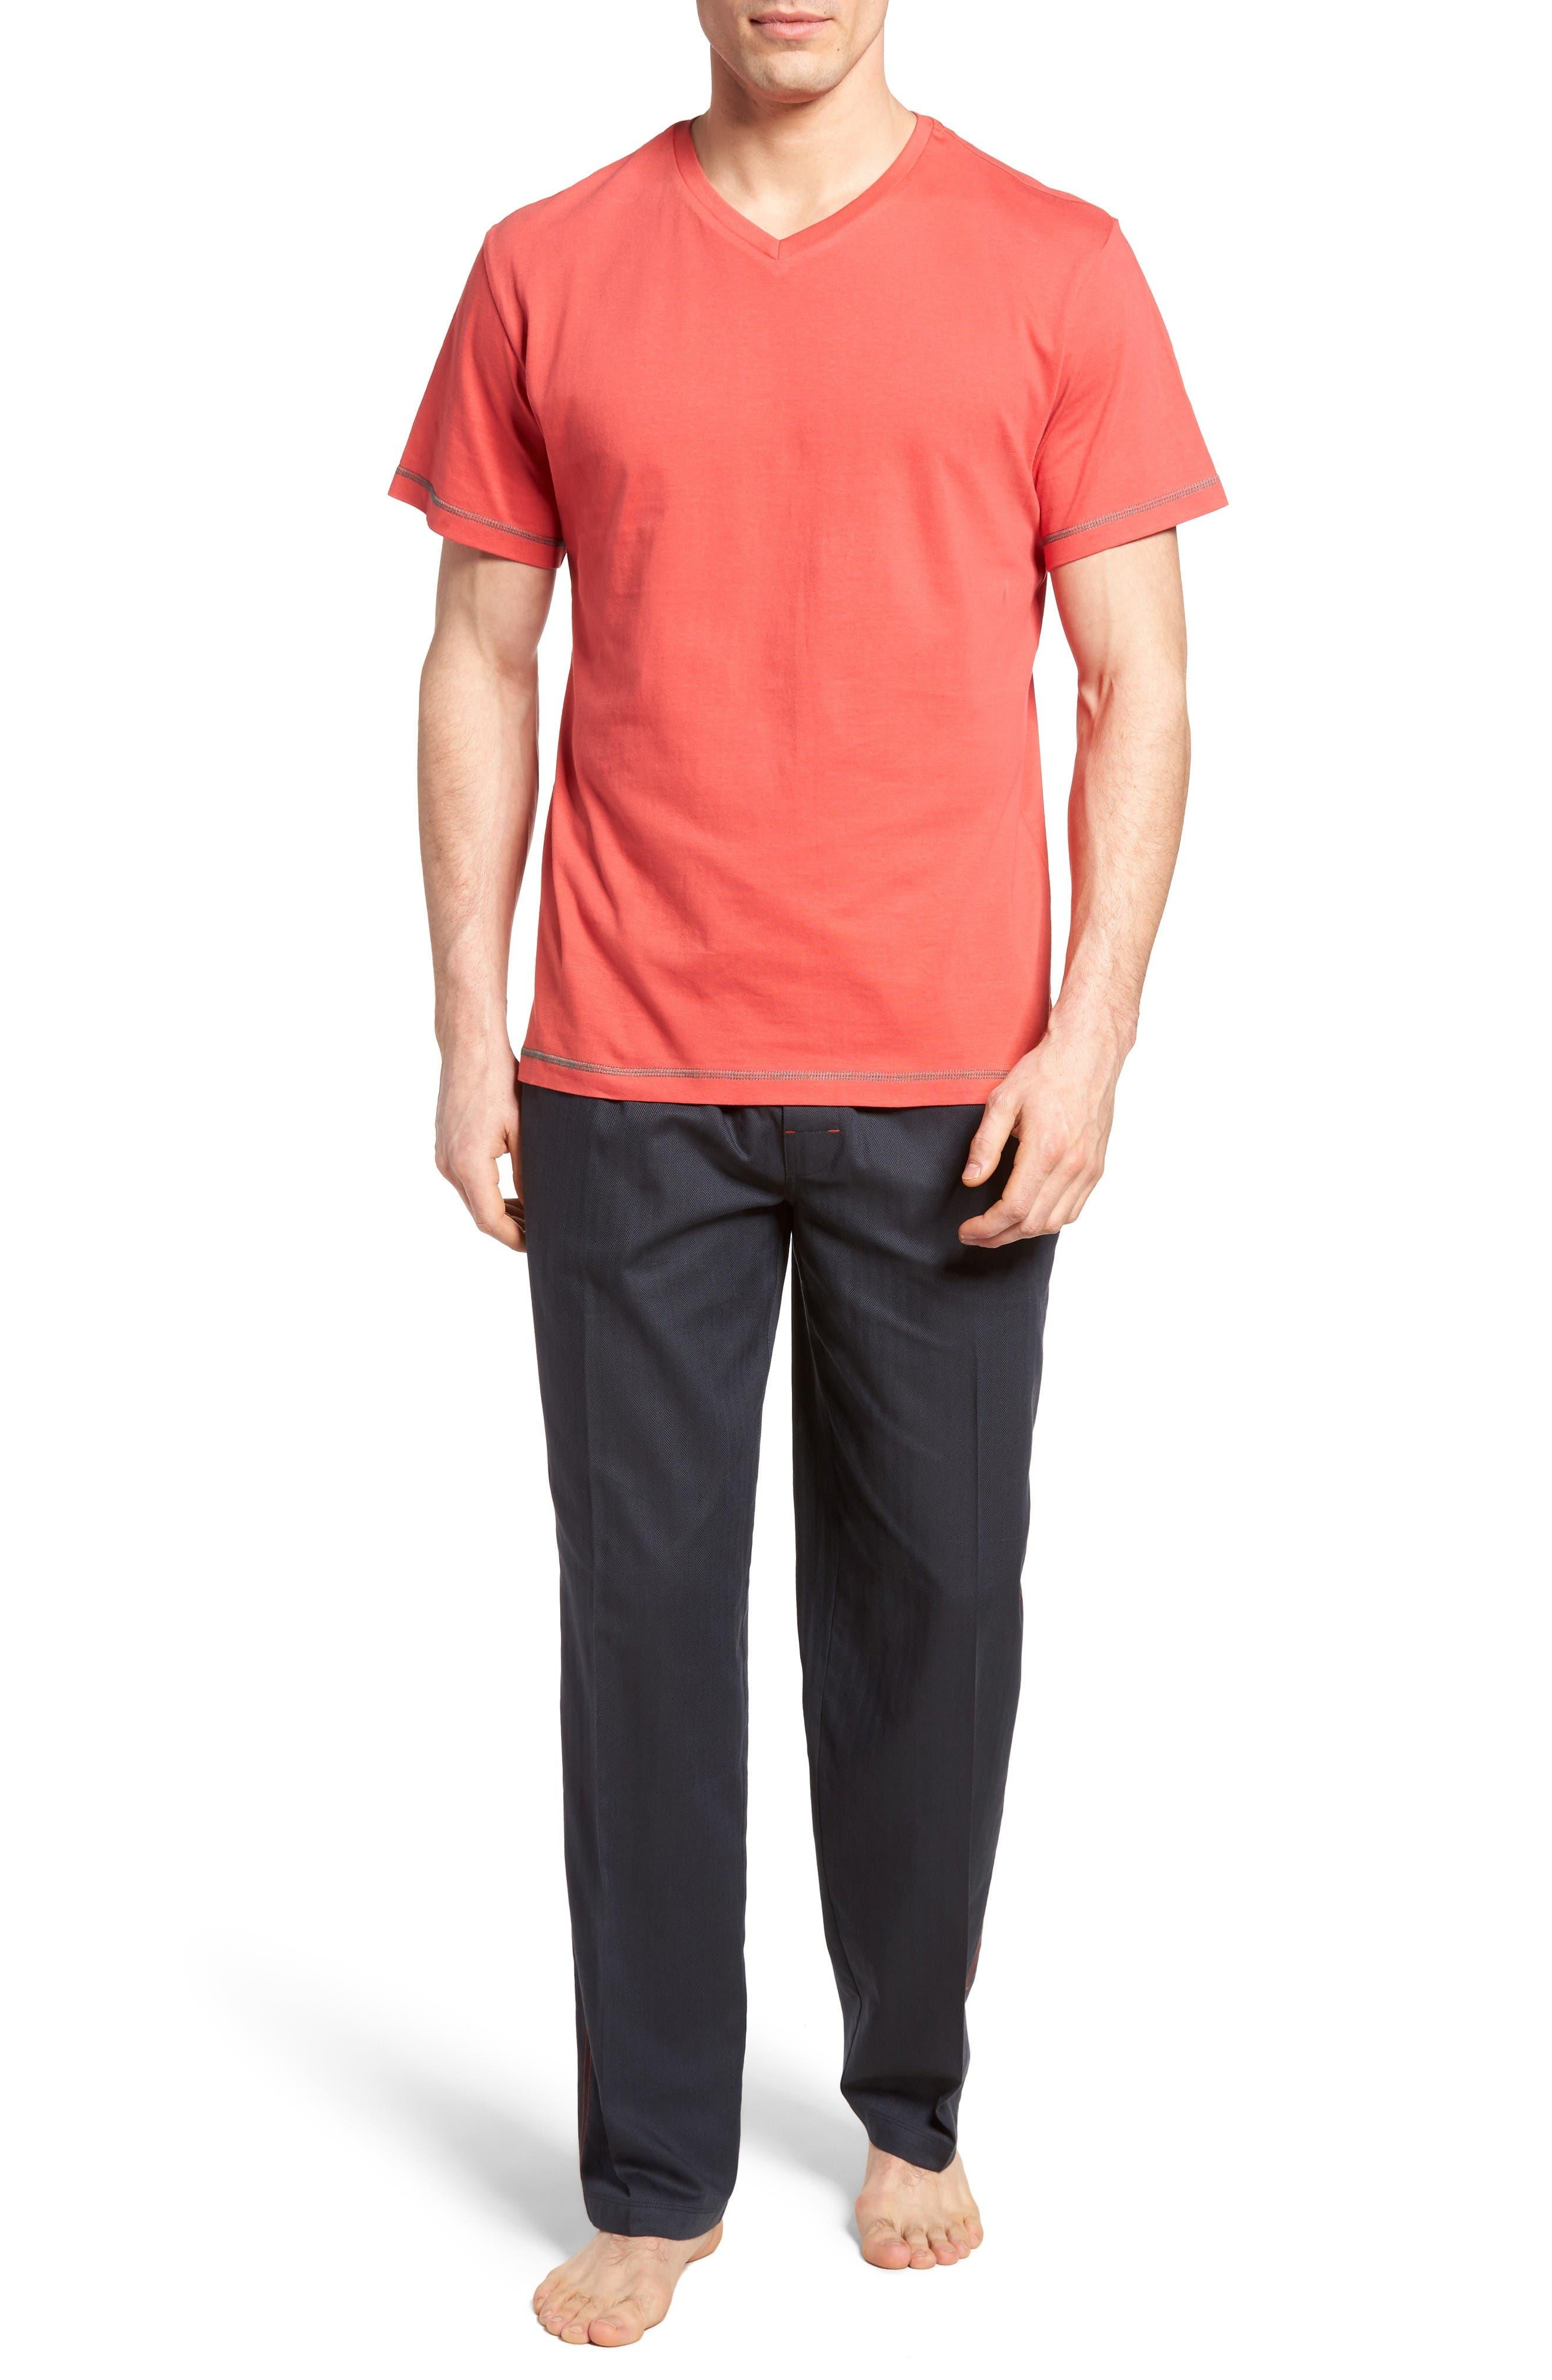 Fusion Pajama Set,                             Main thumbnail 1, color,                             Red/ Lead